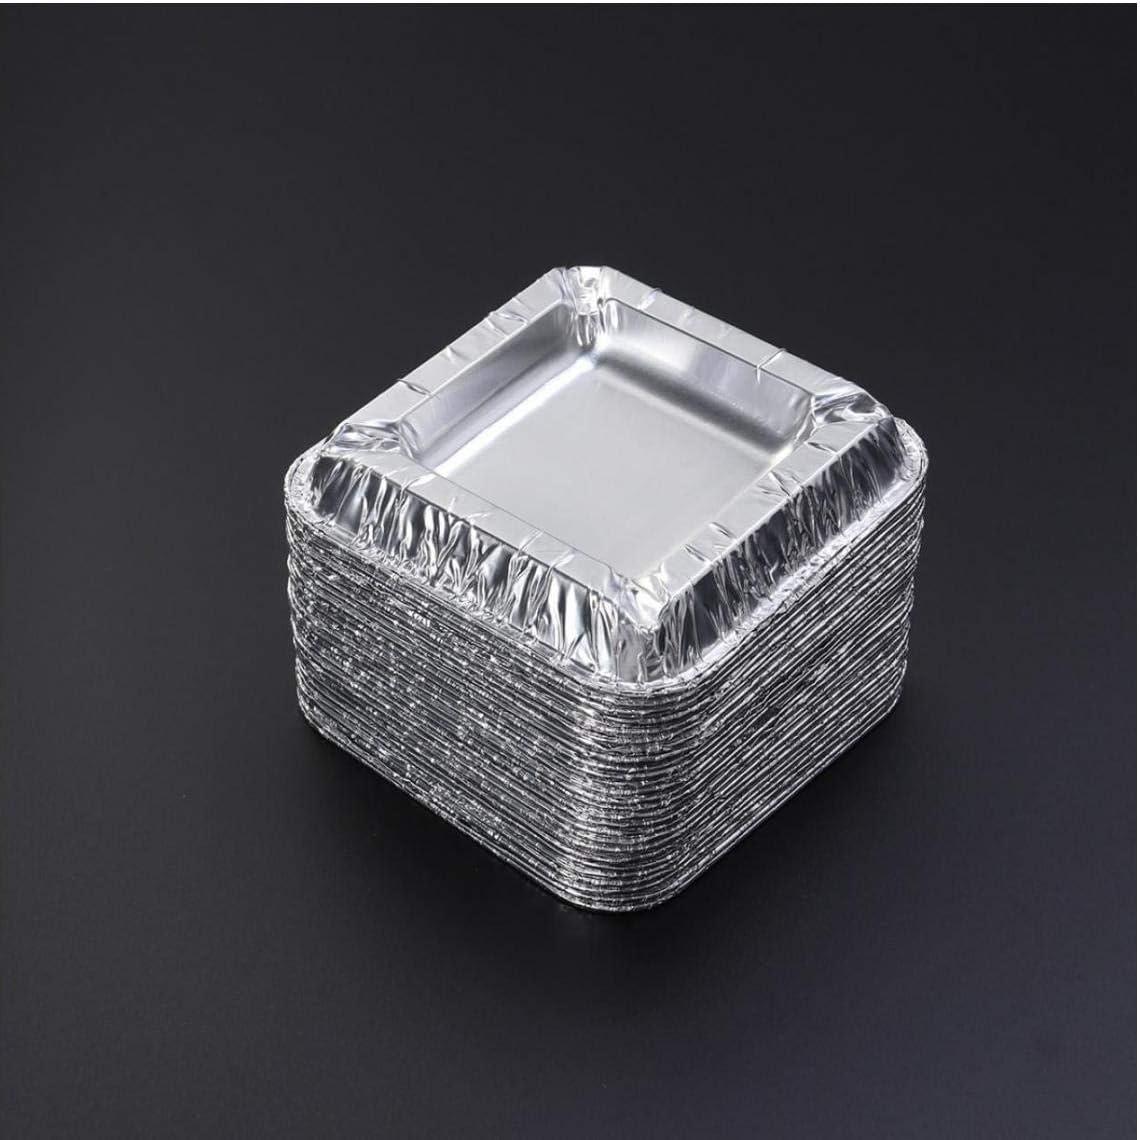 AYRSJCL 25Pc Aluminum Foil Unbreakable Disposable Ashtray C Anti-Fall Small Portative Cigar Ashtray